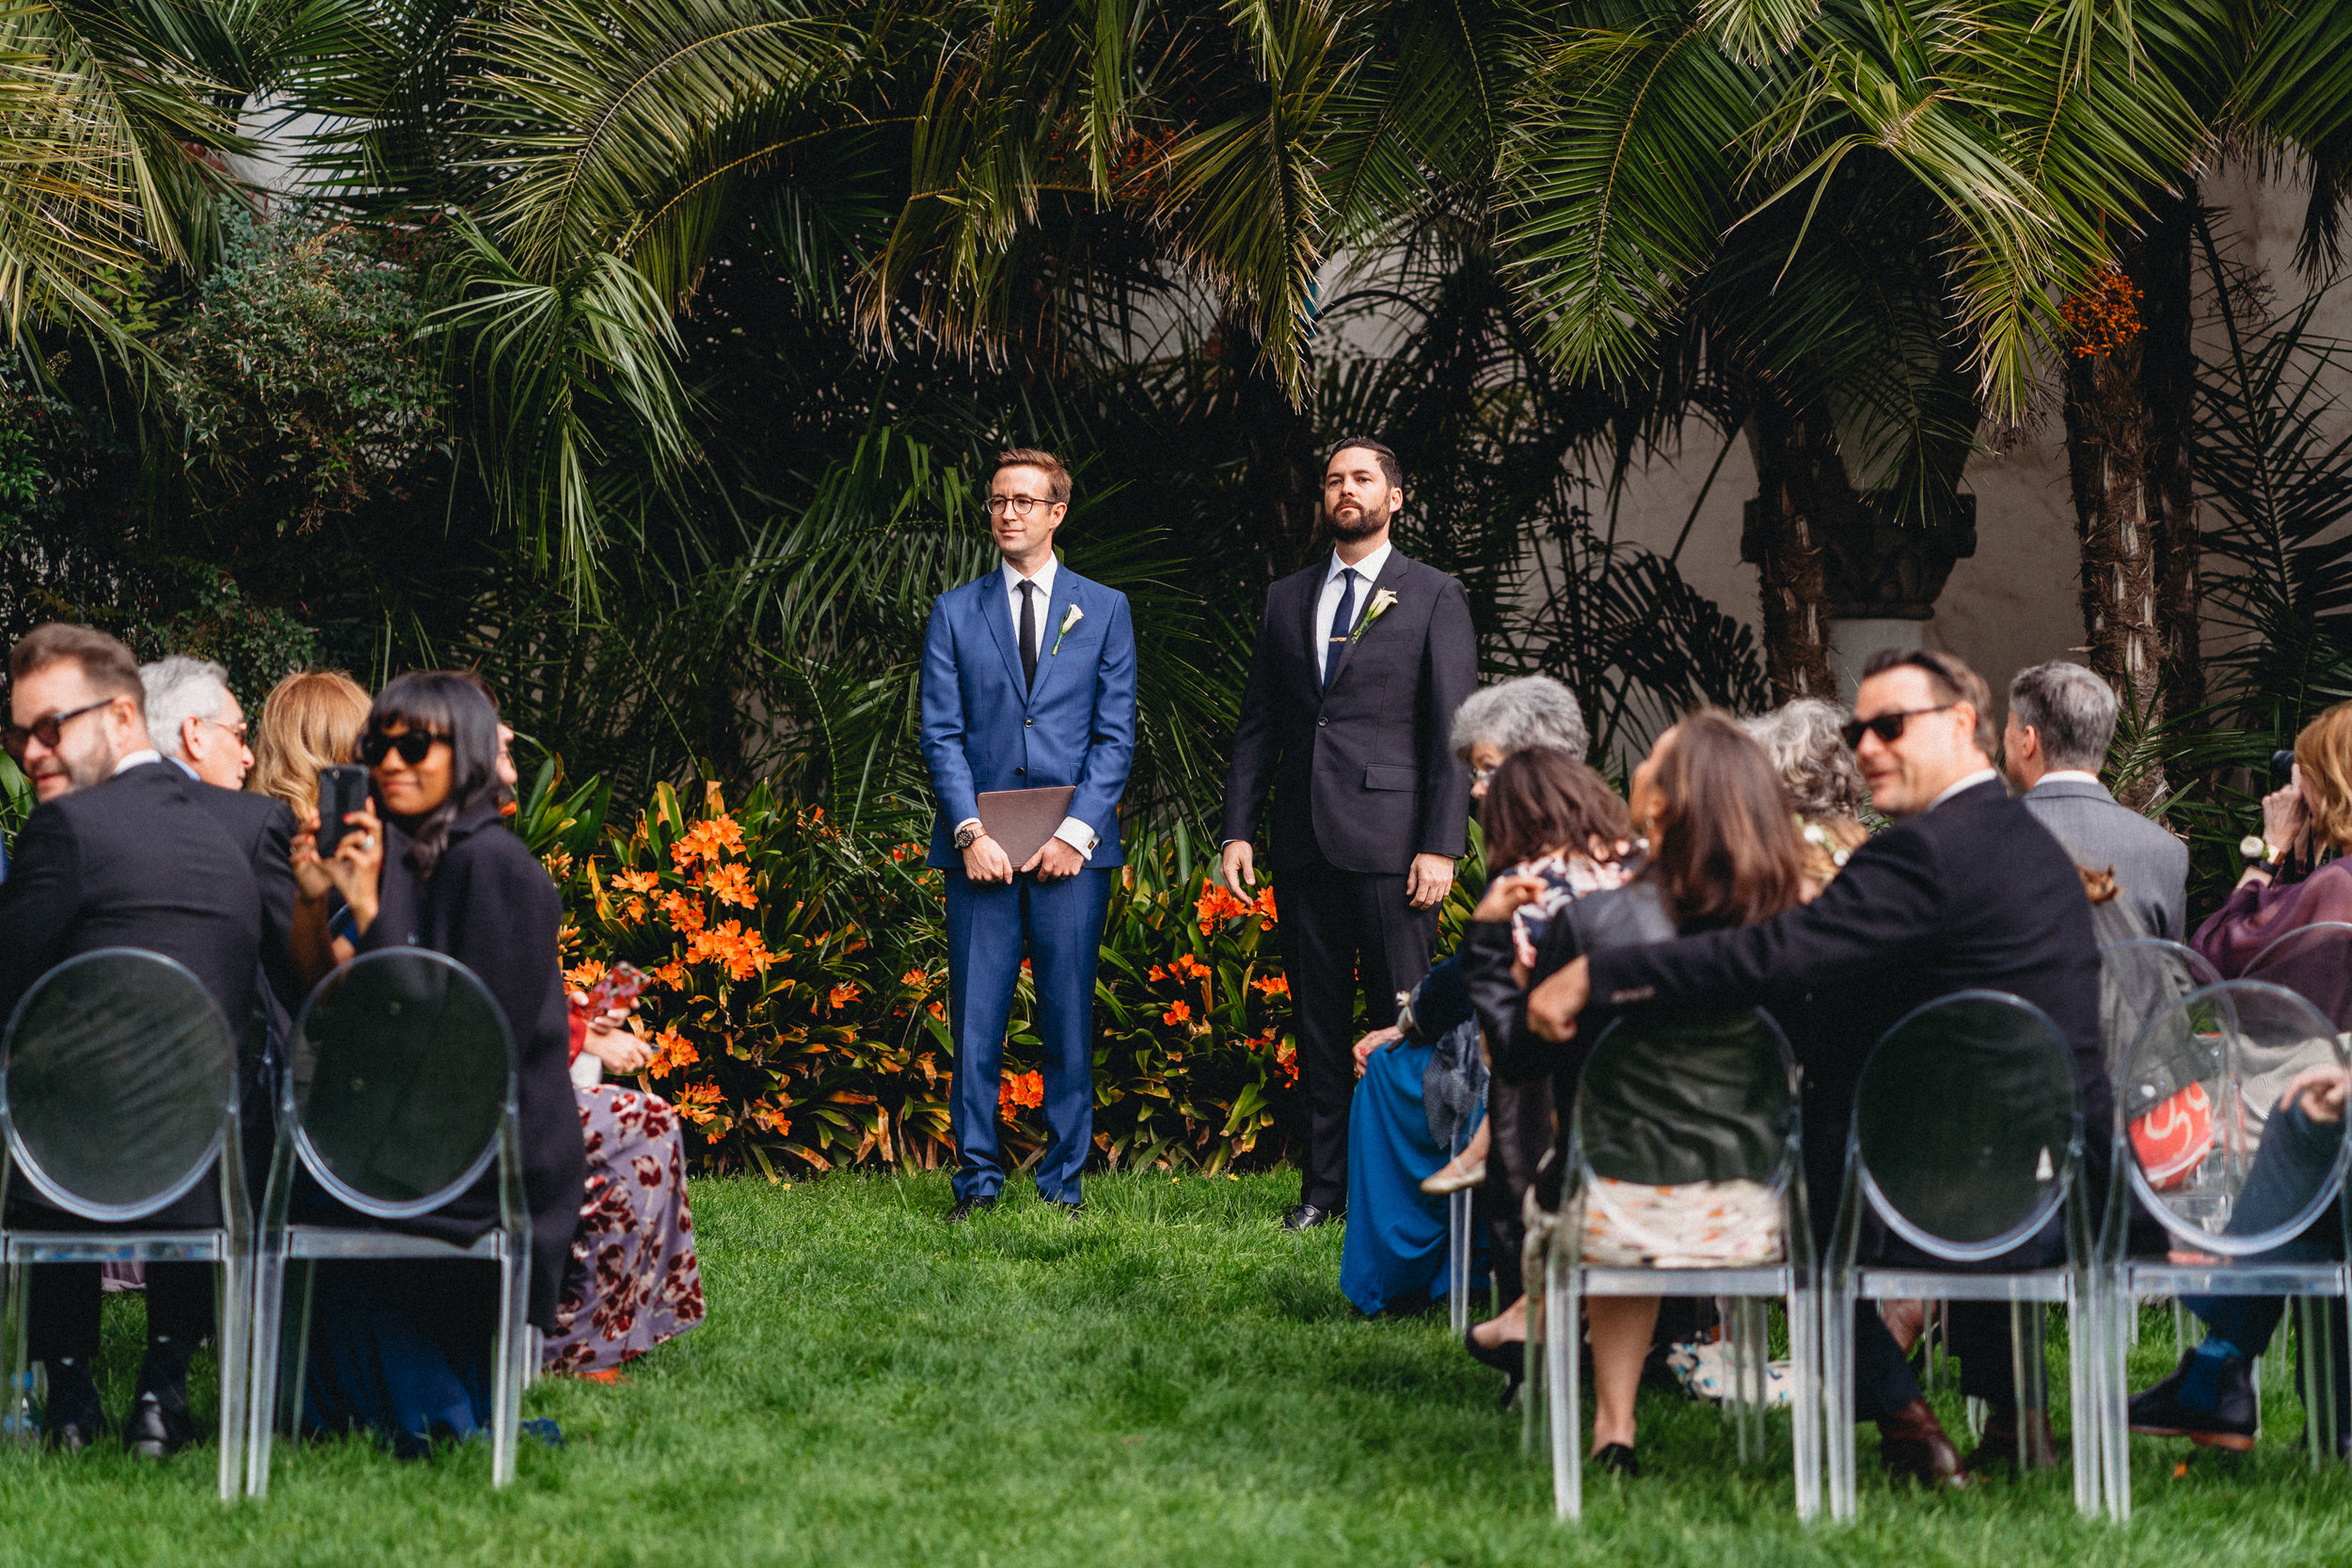 wedding-photography-santa-barbara-courthouse-rebeccaylasotras-37.jpg